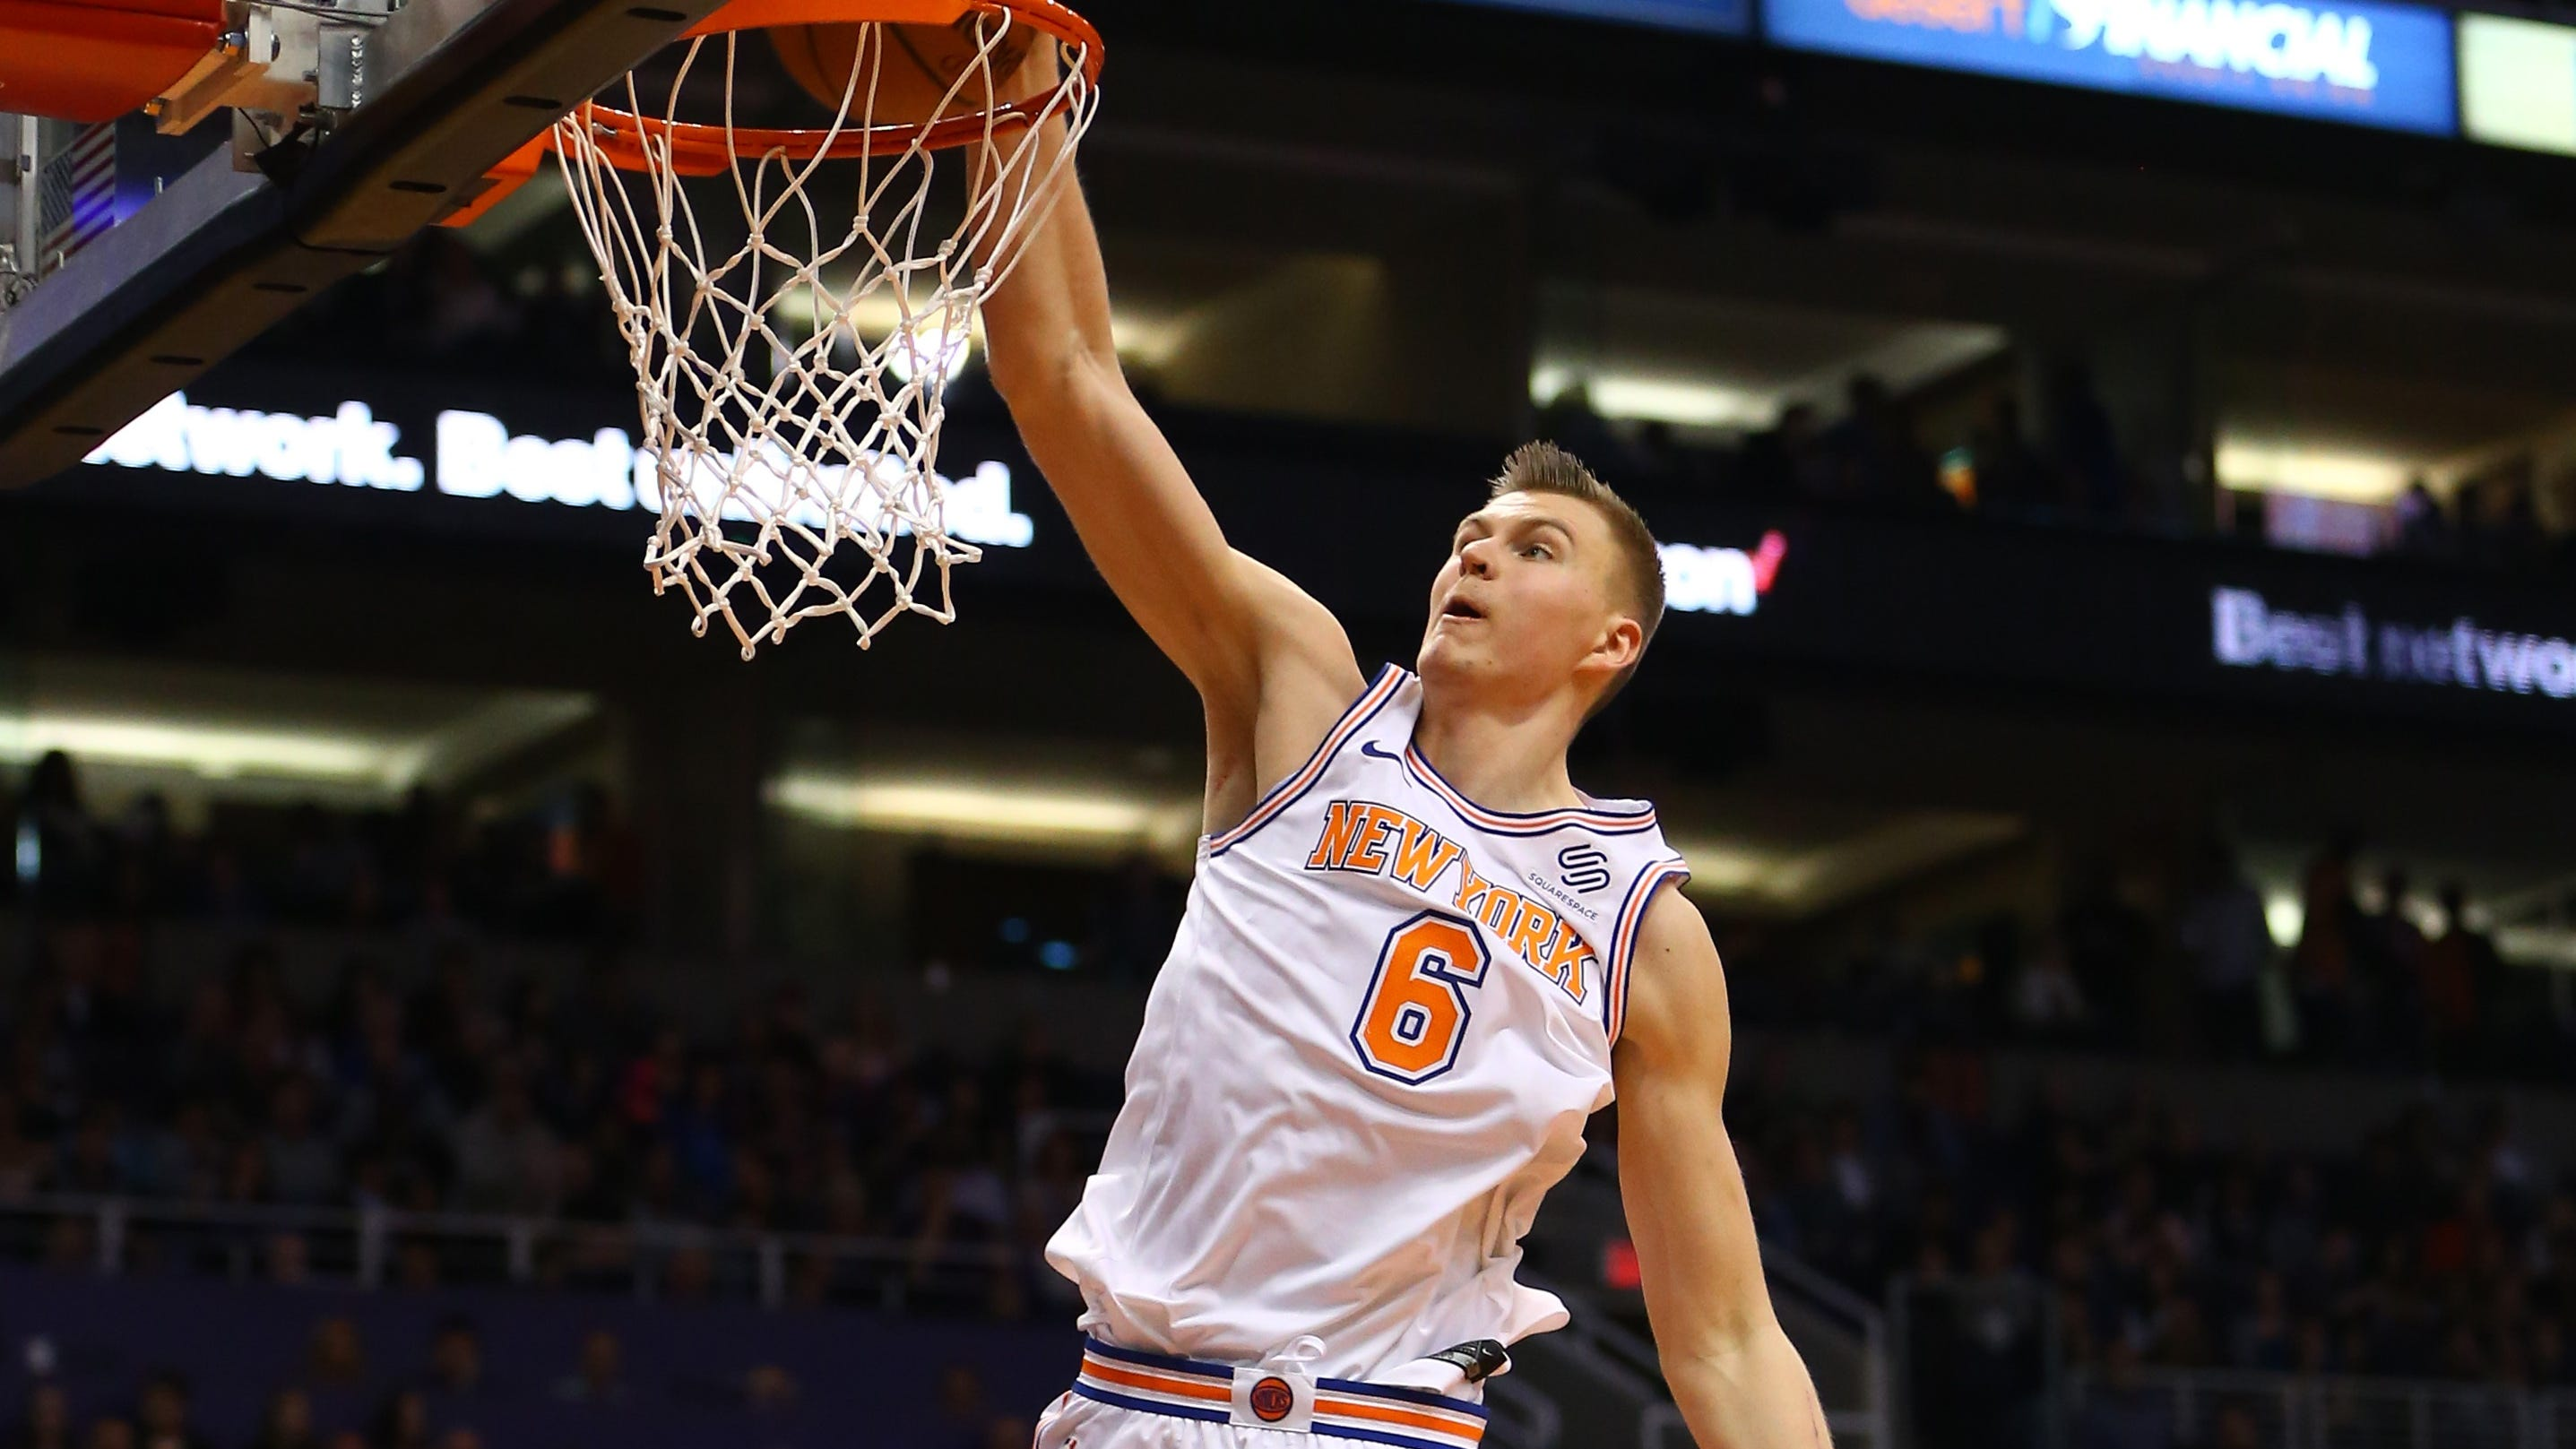 Joakim Noah, Kristaps Porzingis & more: 5 takeaways from New York Knicks press conference